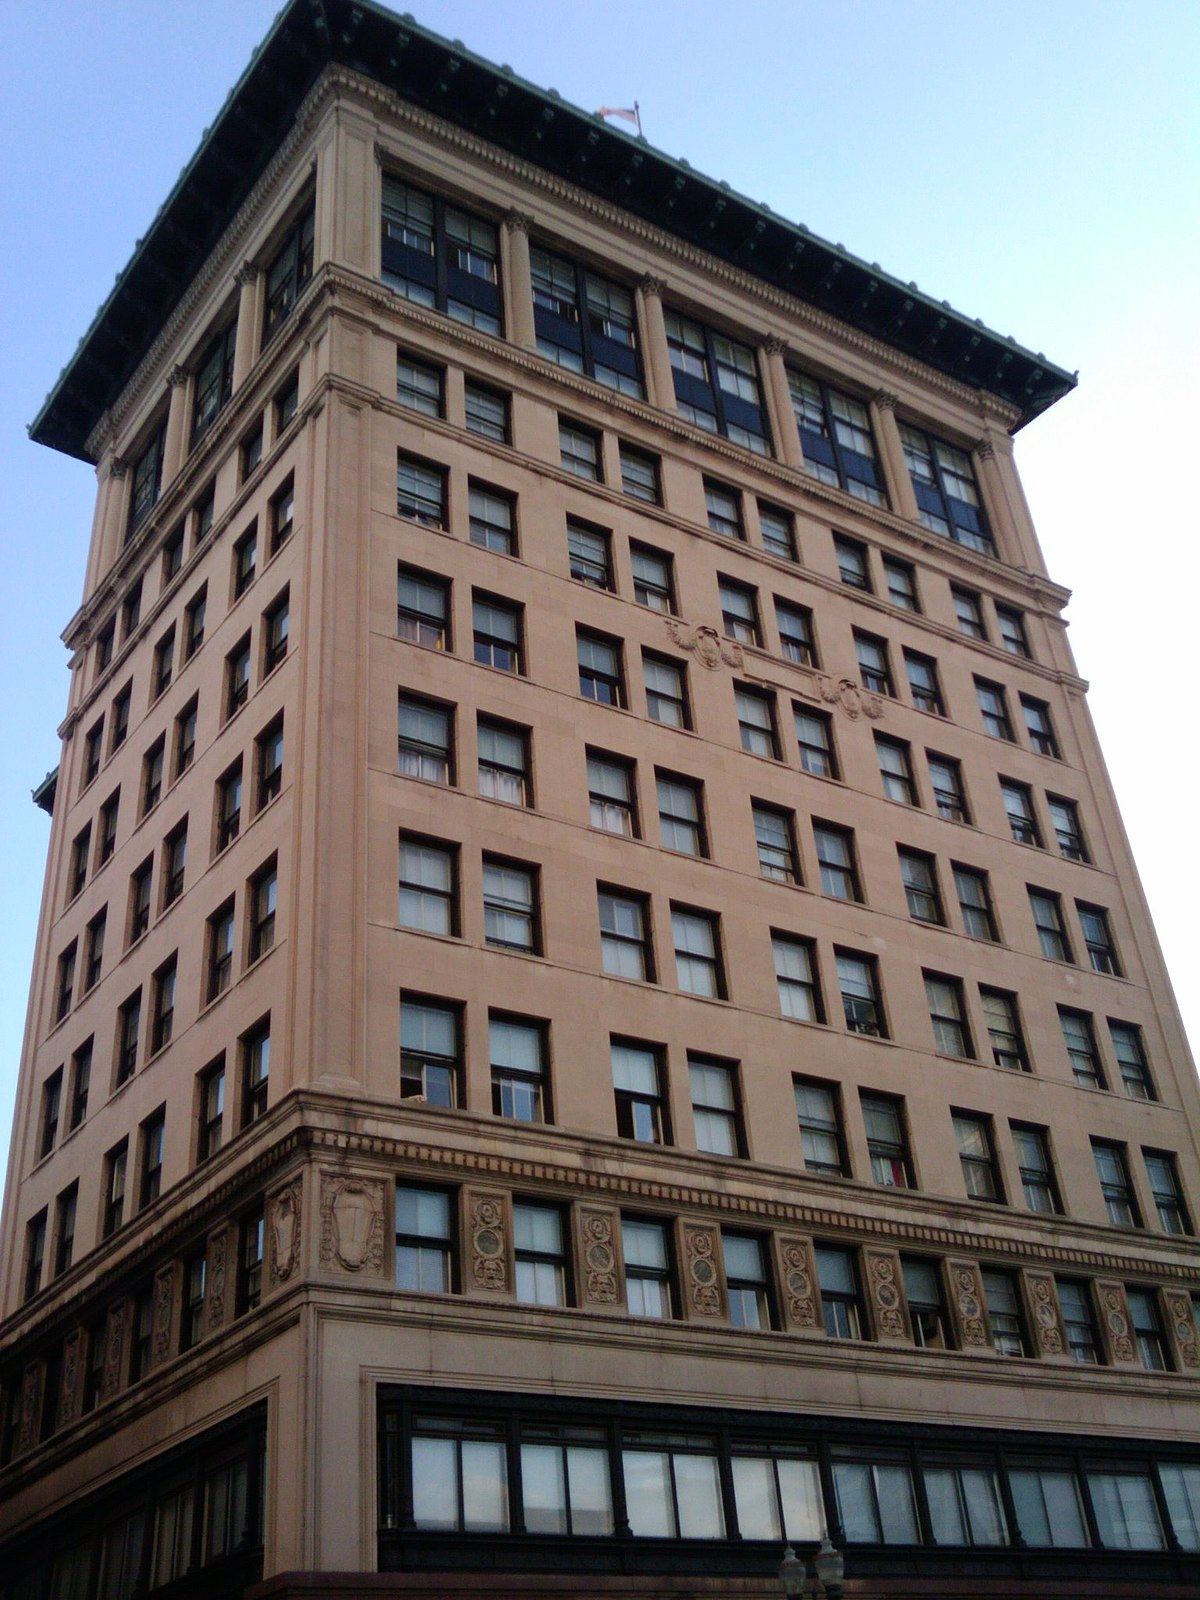 Park Building Worcester Massachusetts Wikipedia